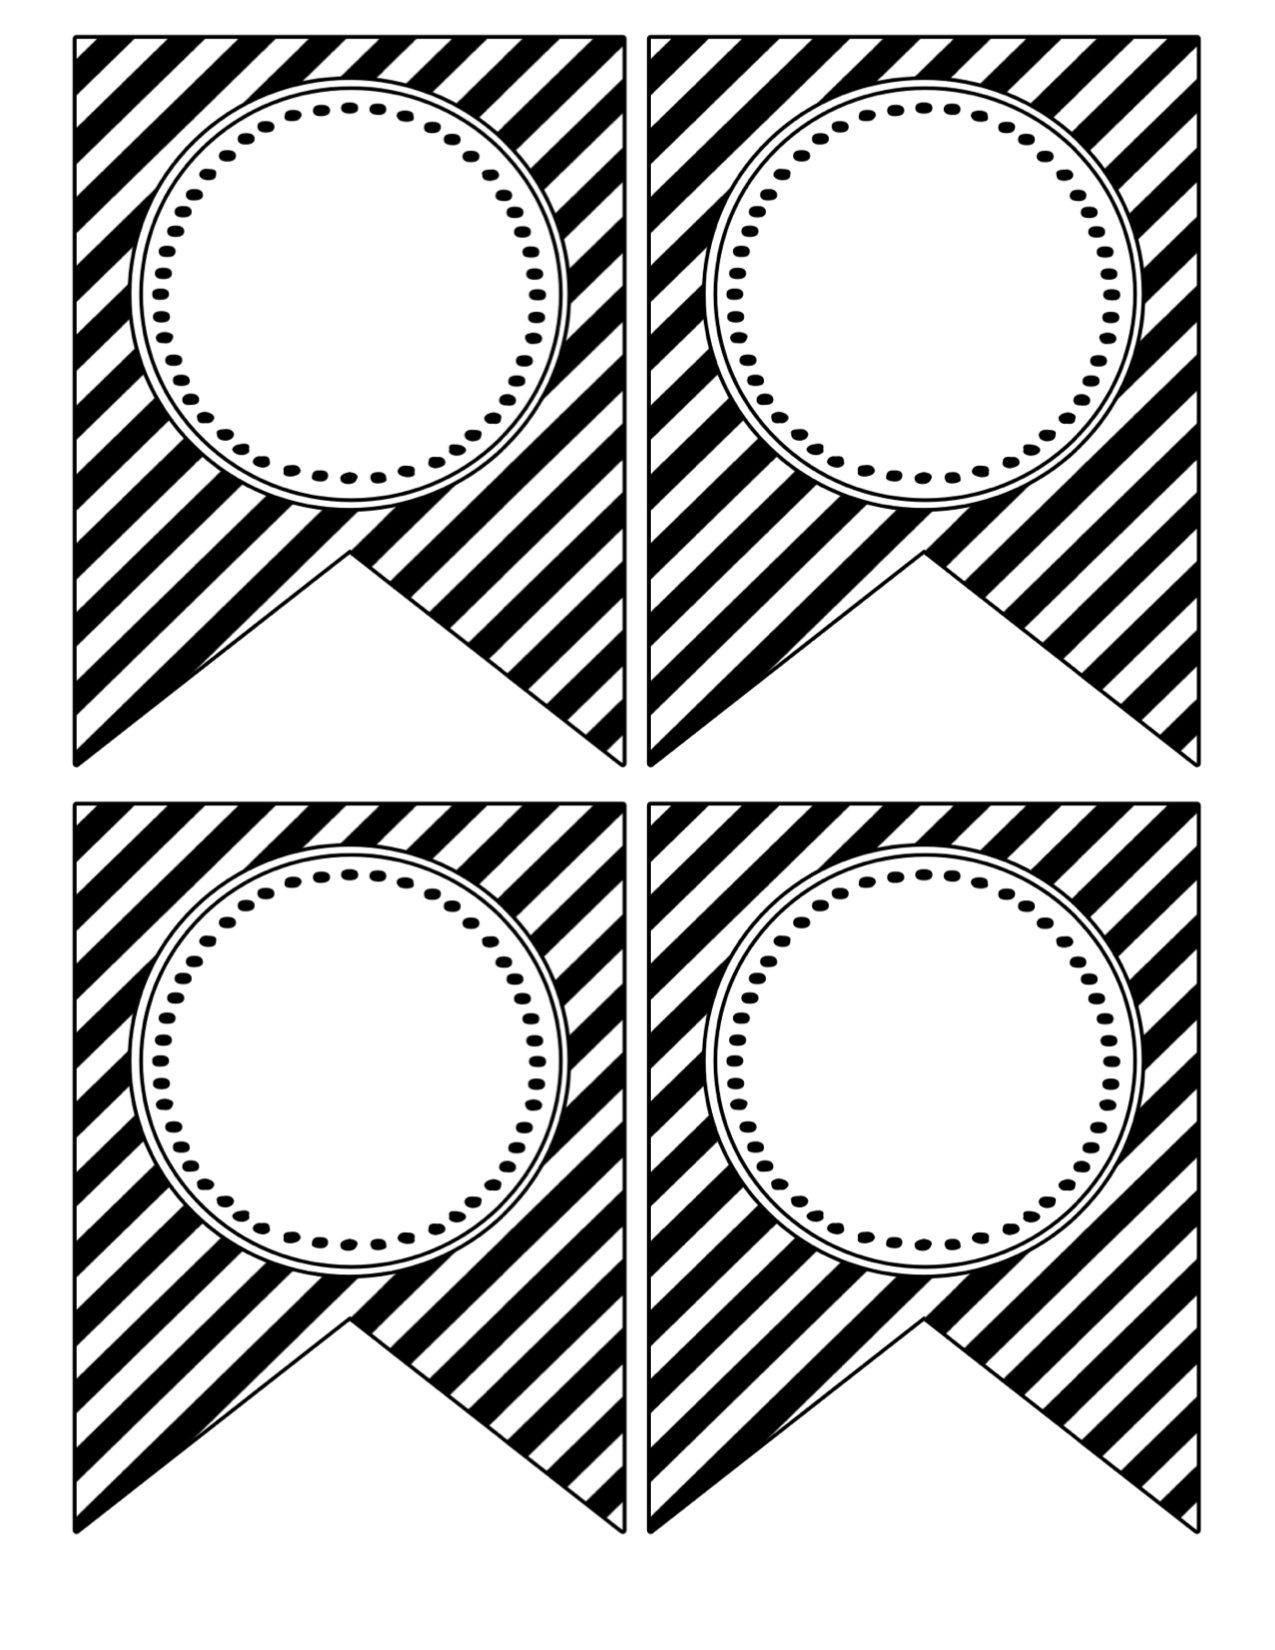 Printable Birthday Banner Template Black And White | Theveliger - Birthday Banner Templates Free Printable